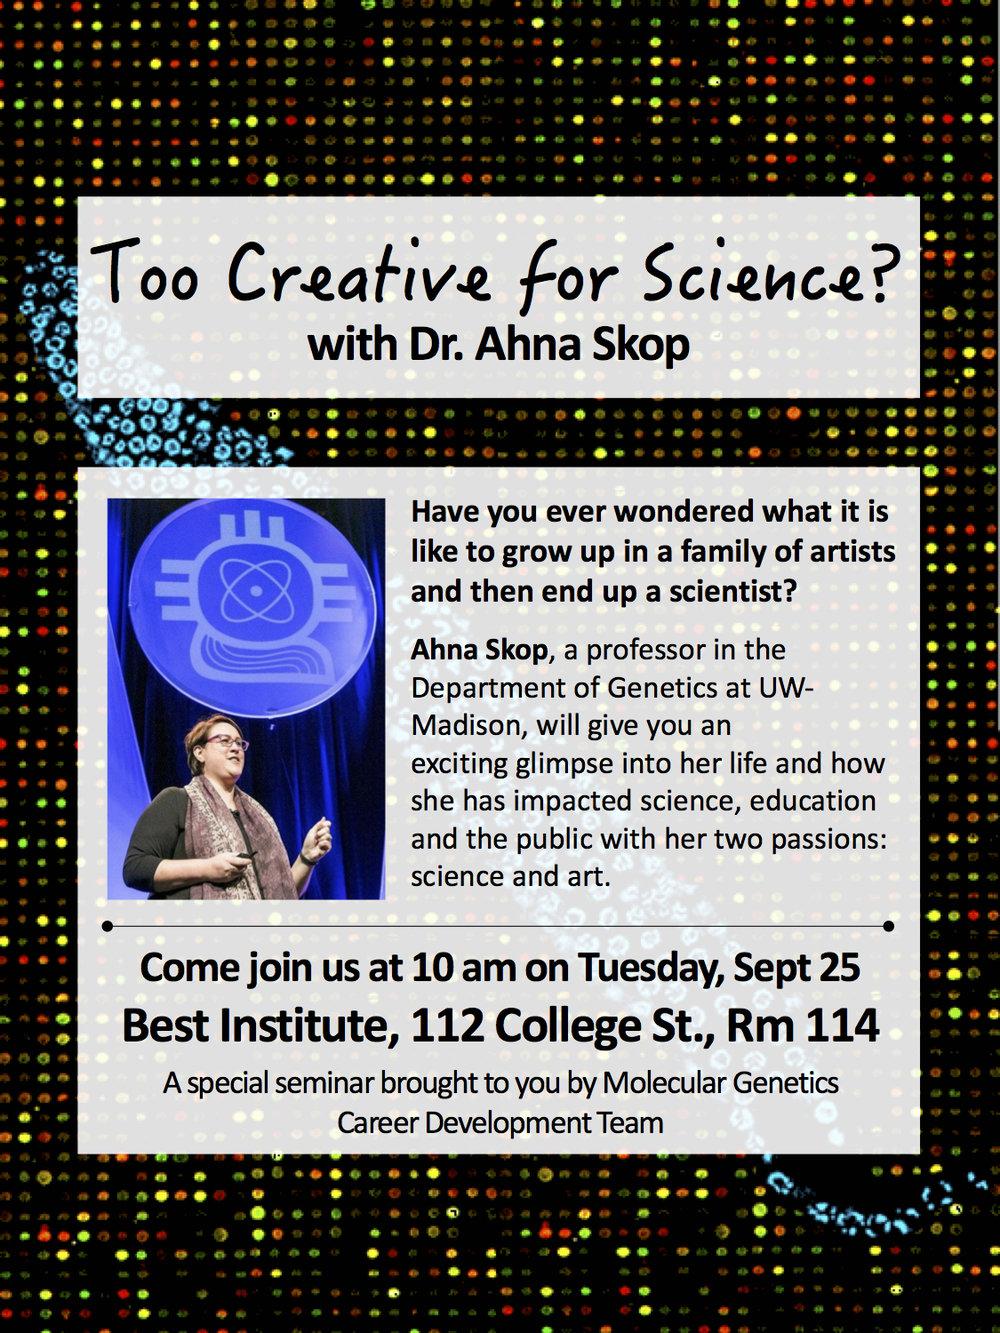 Too Creative for Science - Ahna Skop Workshop Poster.jpg